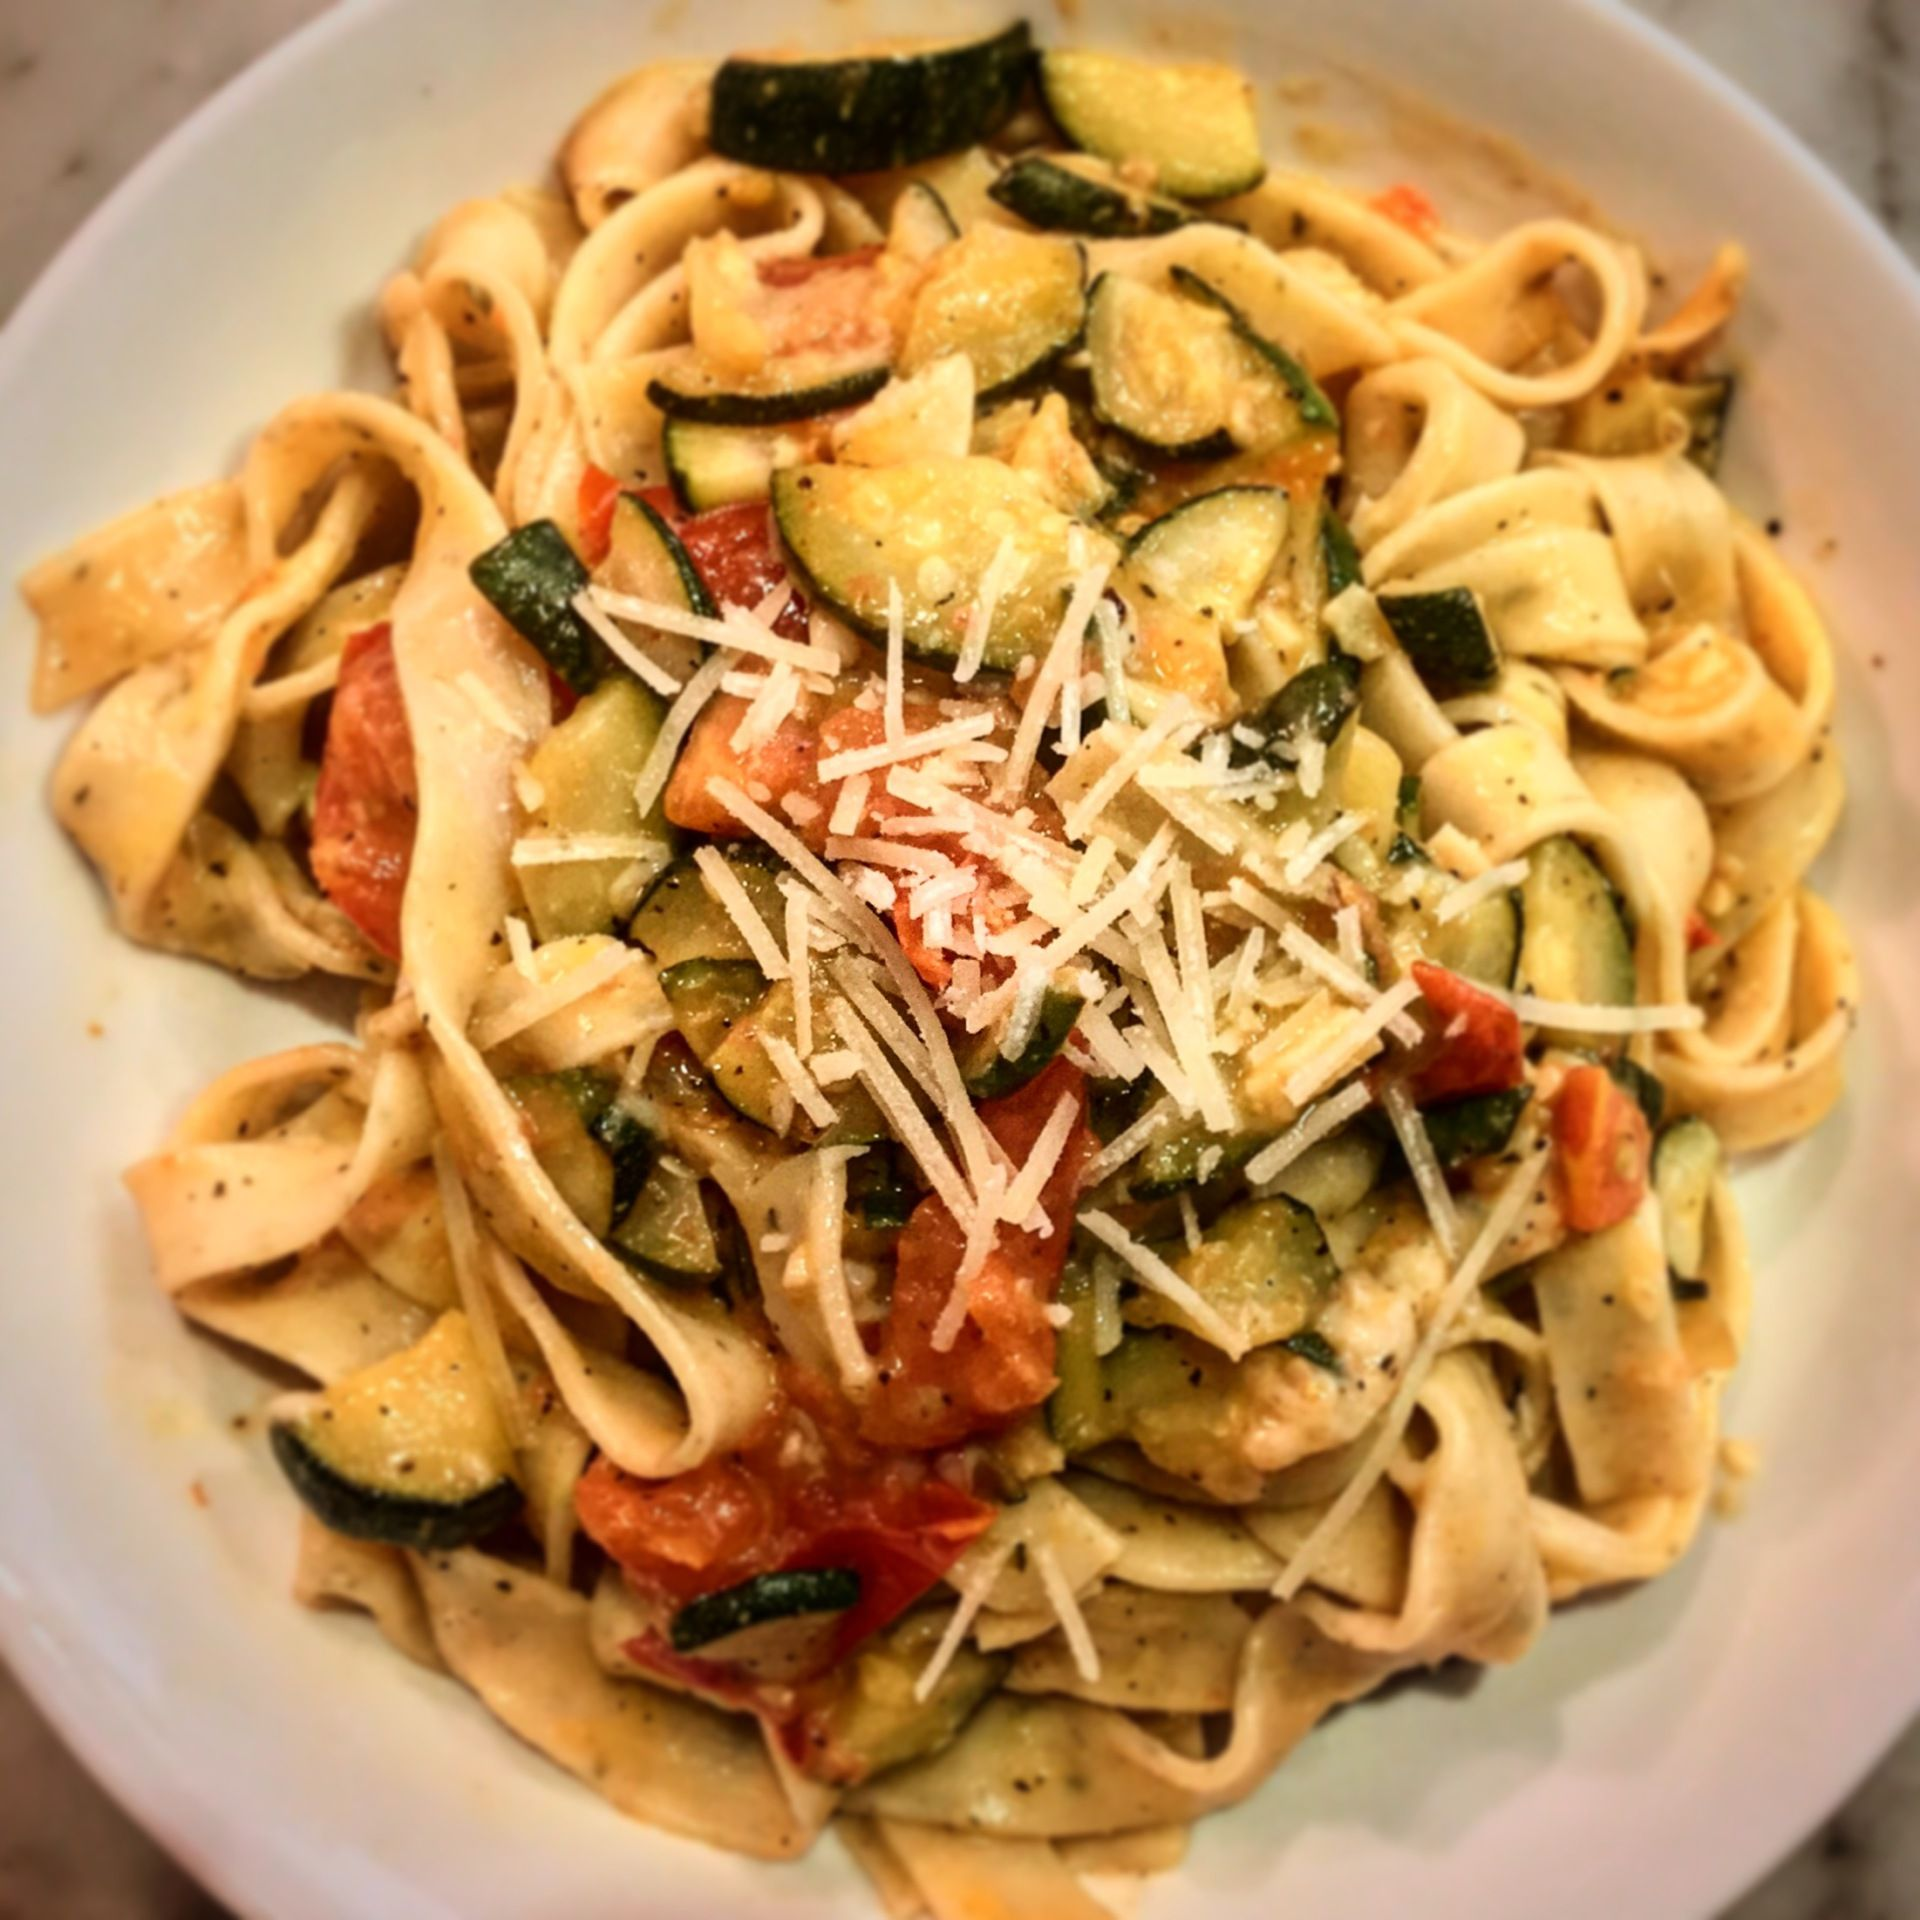 Blue apron yellow tomato pasta - Fresh Basil Fettuccine With Saut Ed Cherry Tomatoes Zucchini